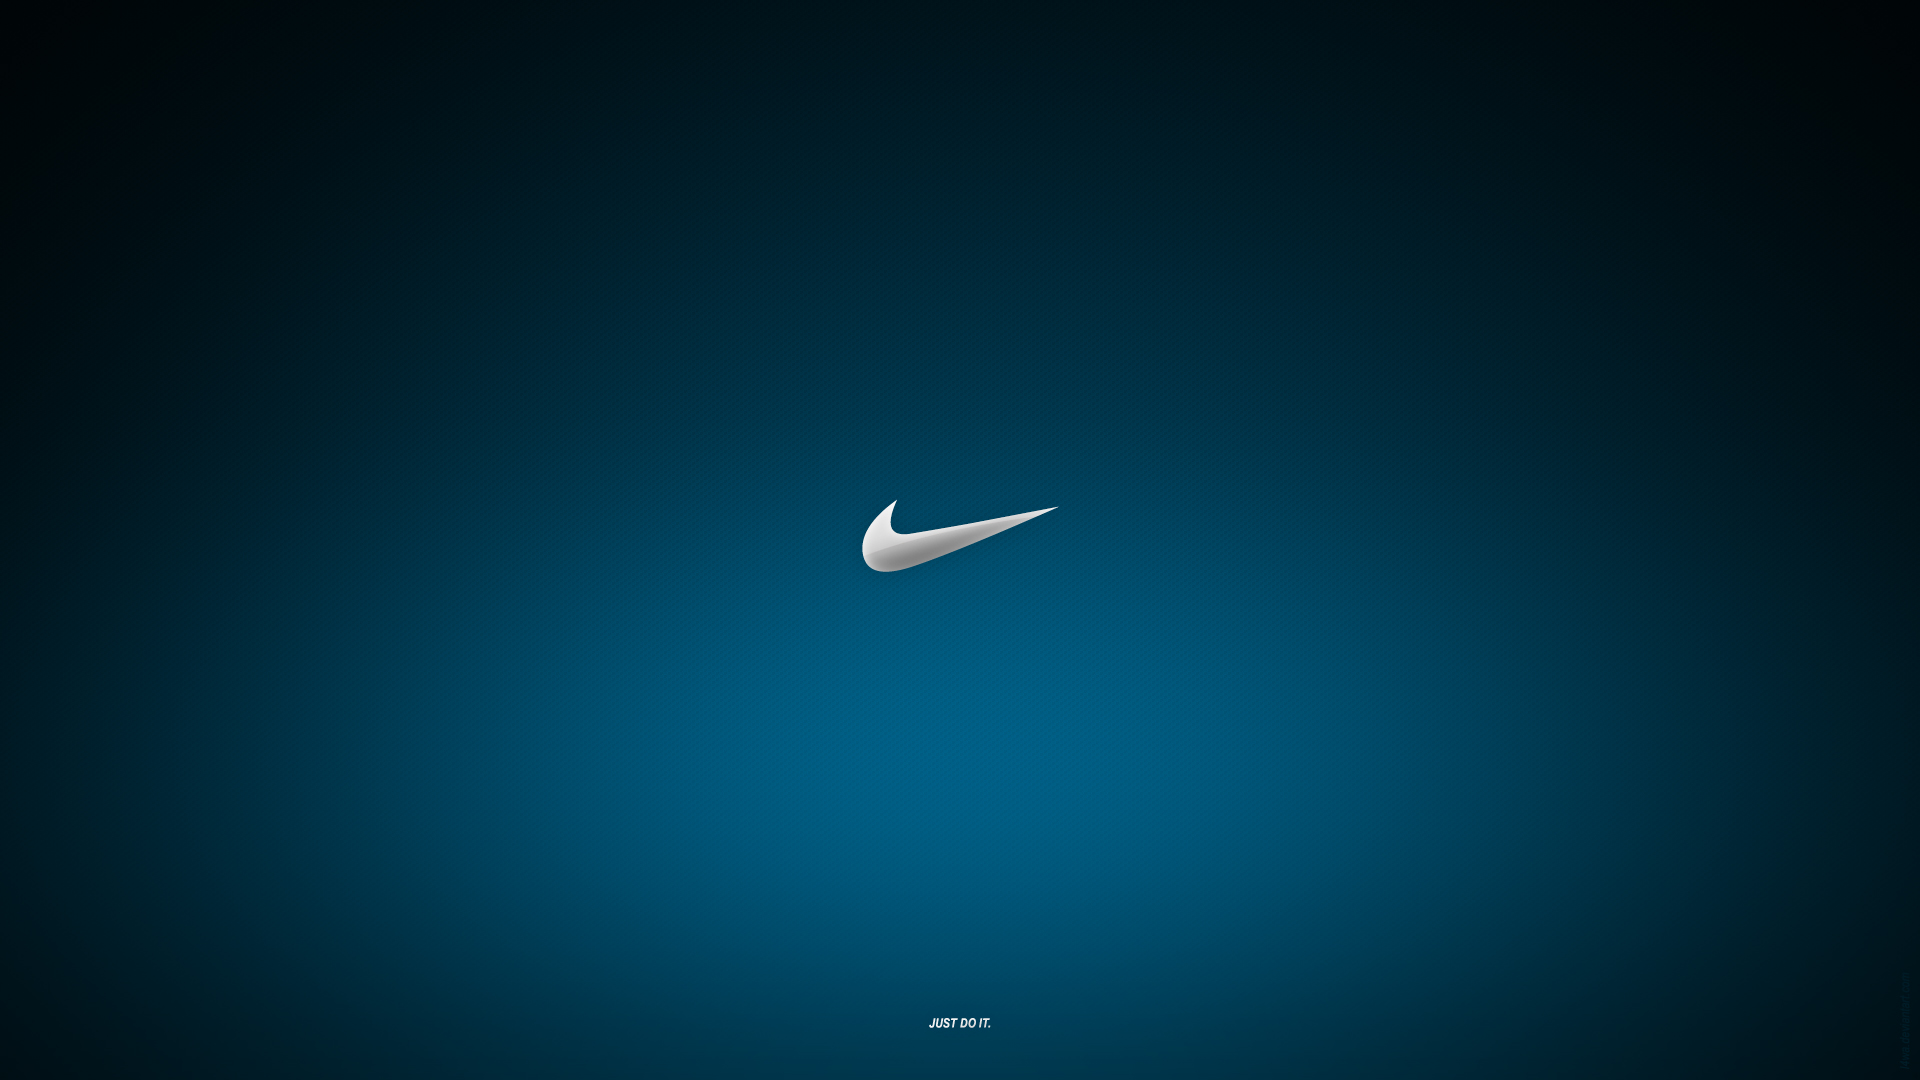 nike_just_do_it_by_ociq-d3ku6s3.jpg Nike Logo 1920x1080